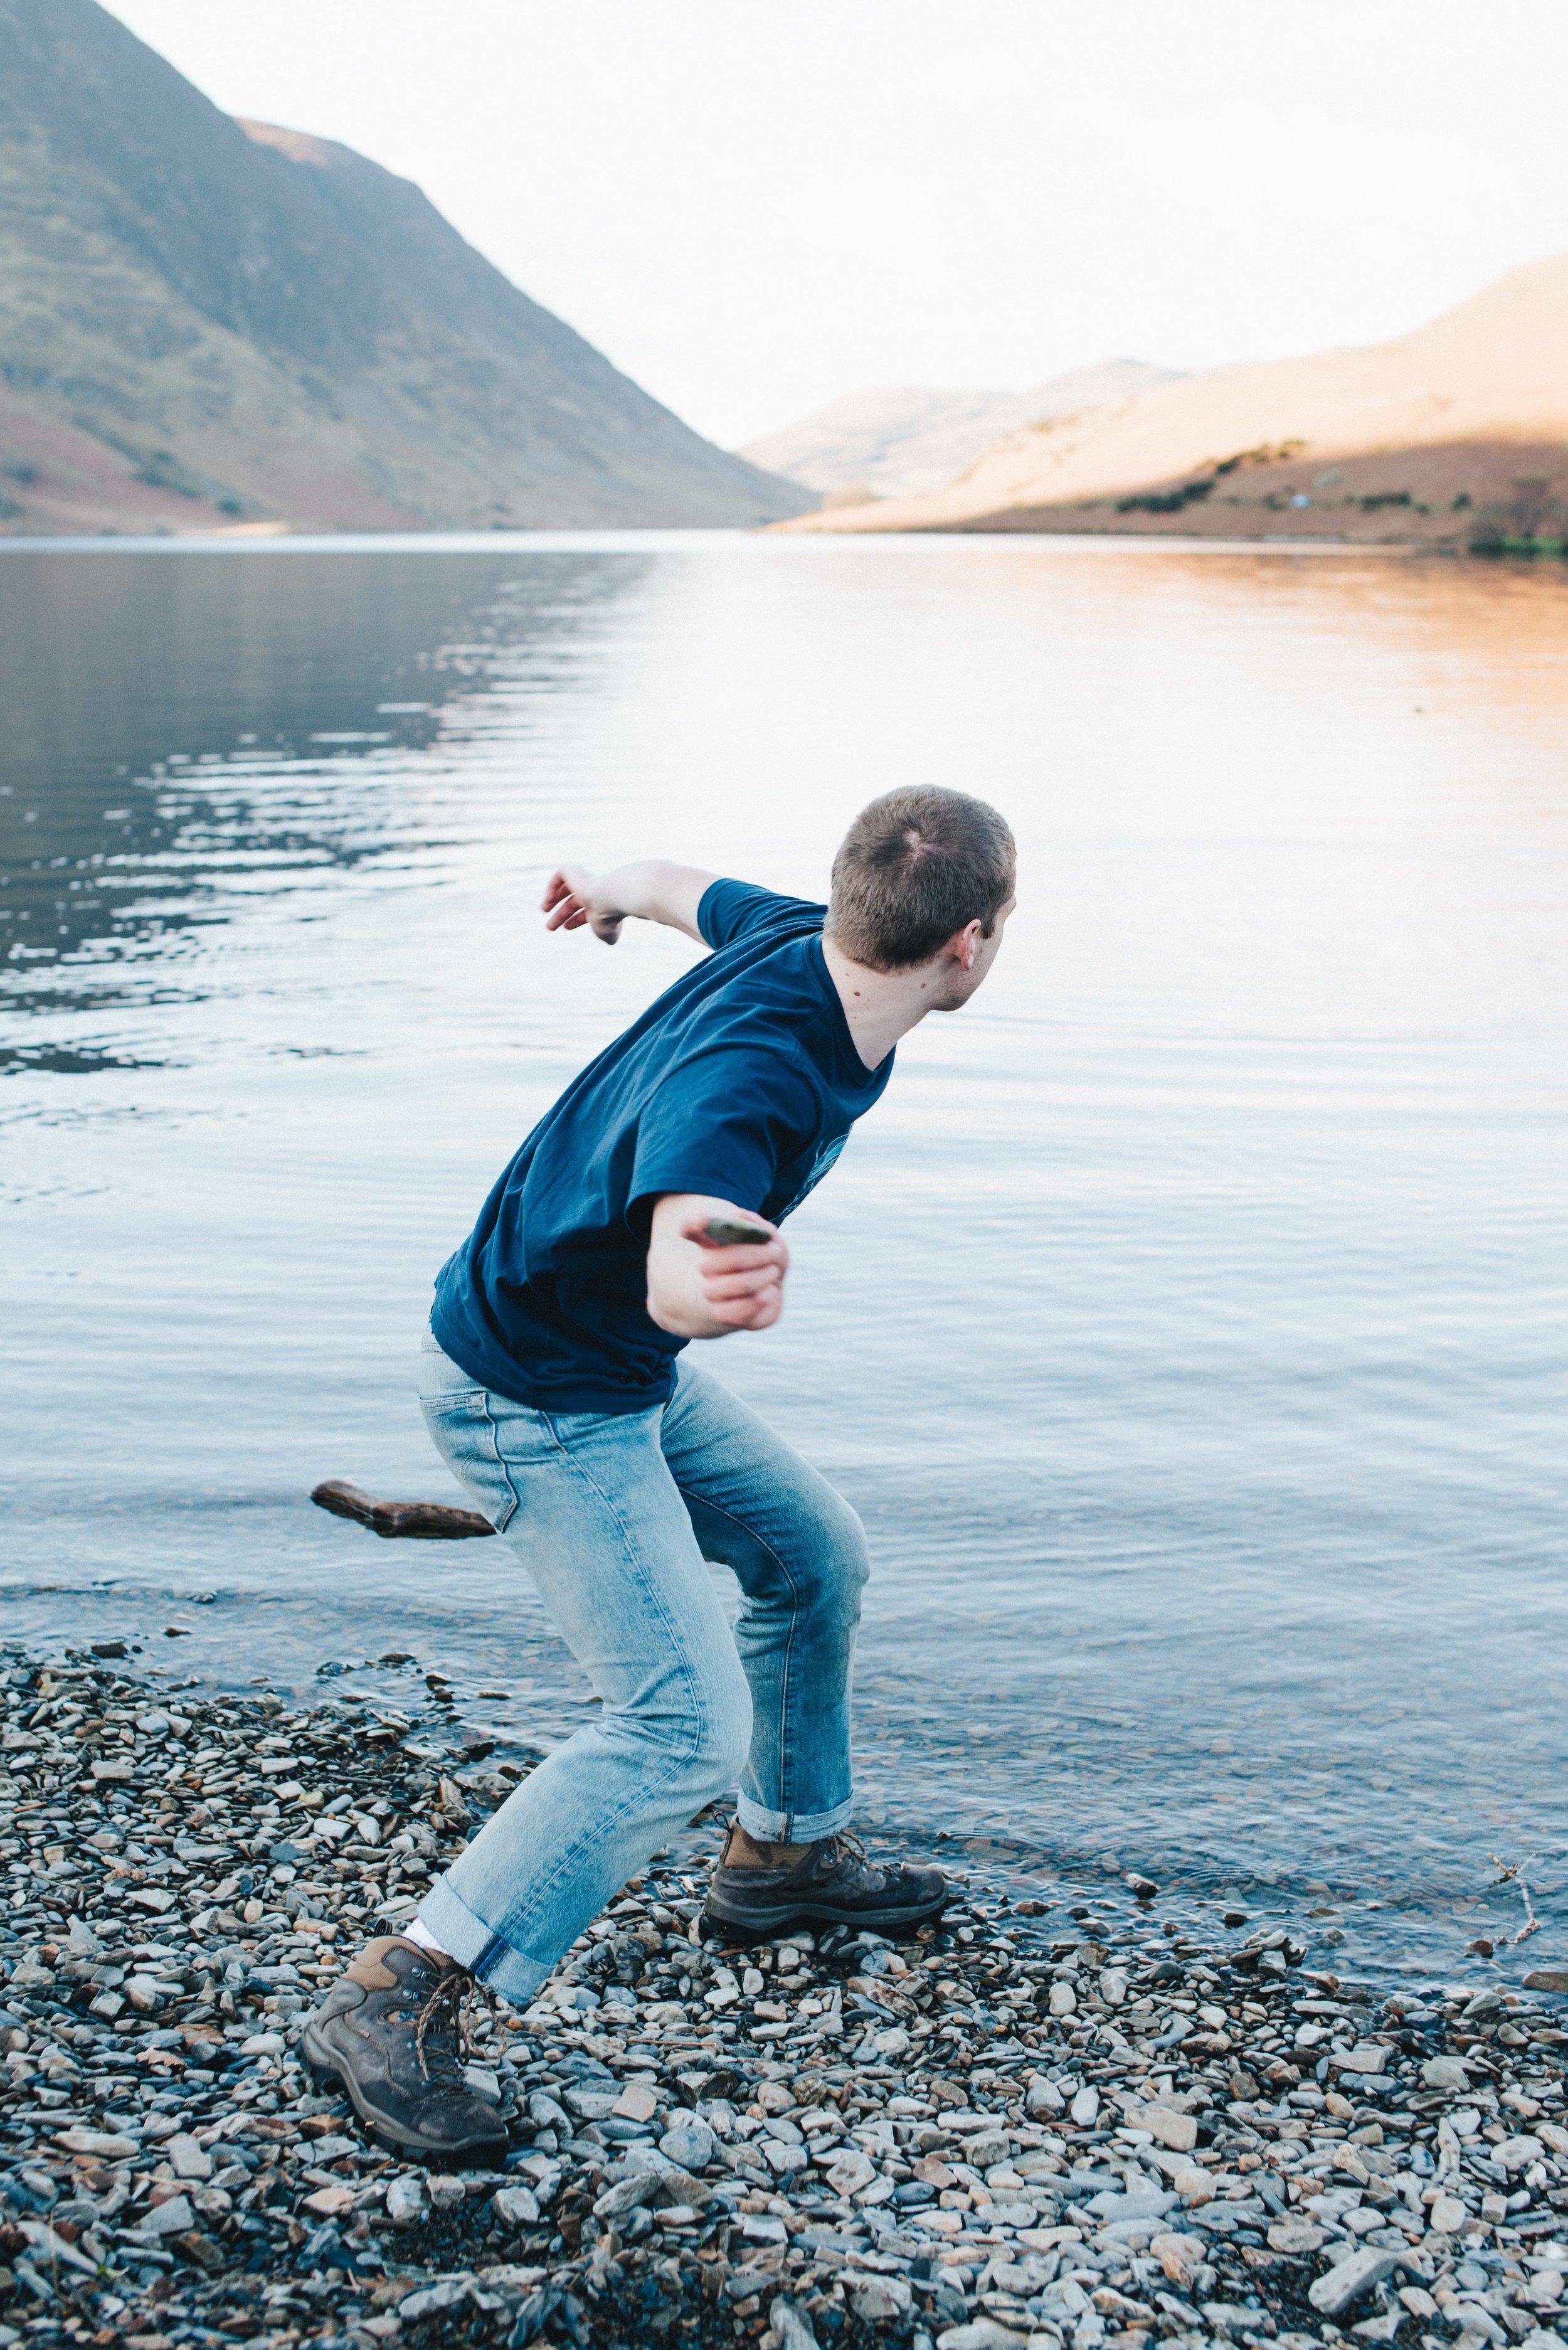 Harry Renton - skipping stones on a calm lake - Hippo Magazine